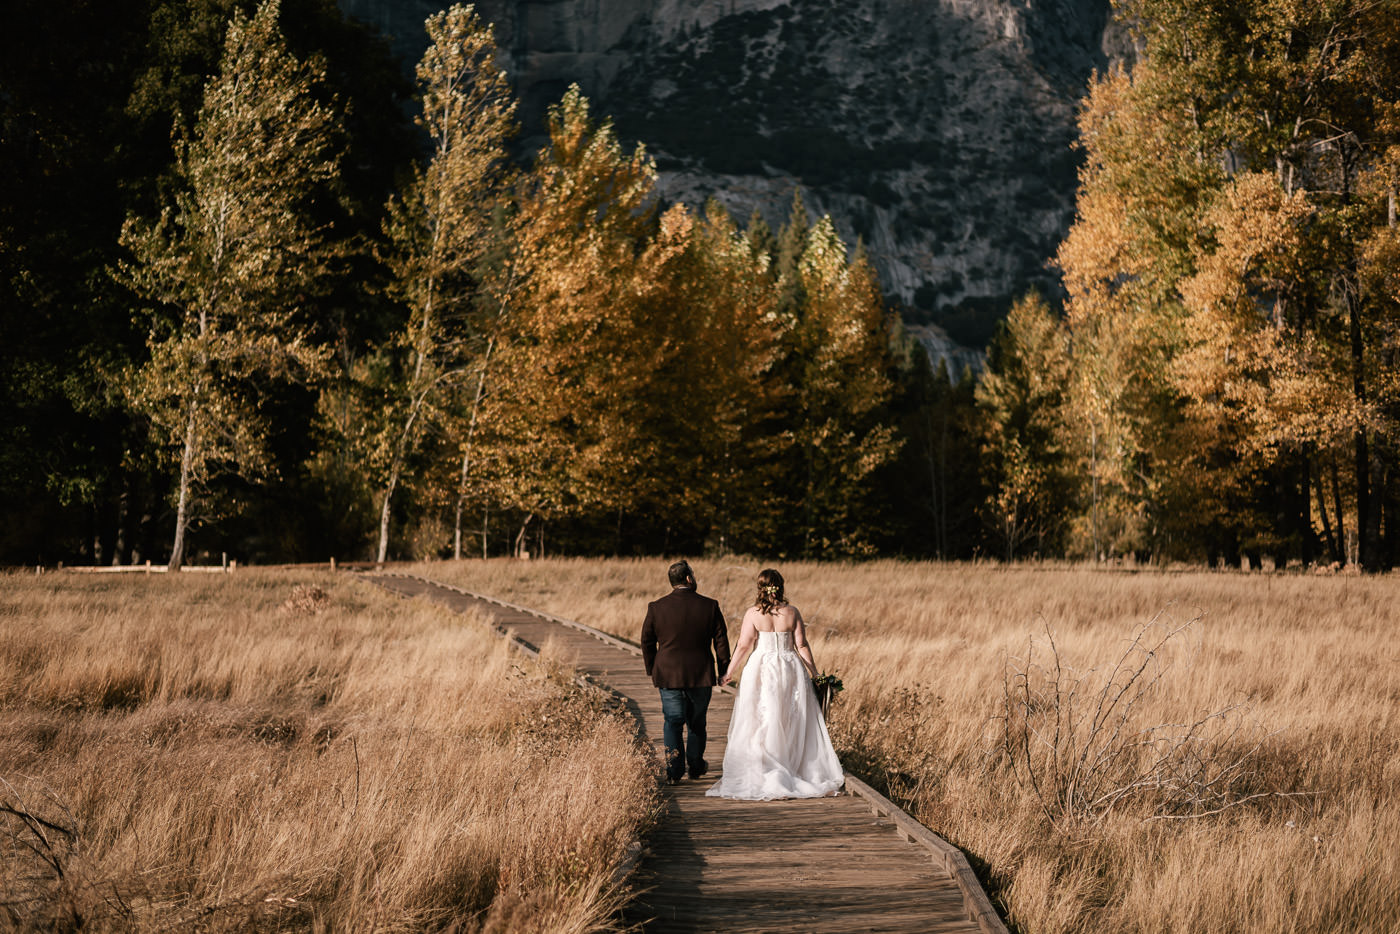 yosemite-meadow-wedding-photos-sunset-1.jpg